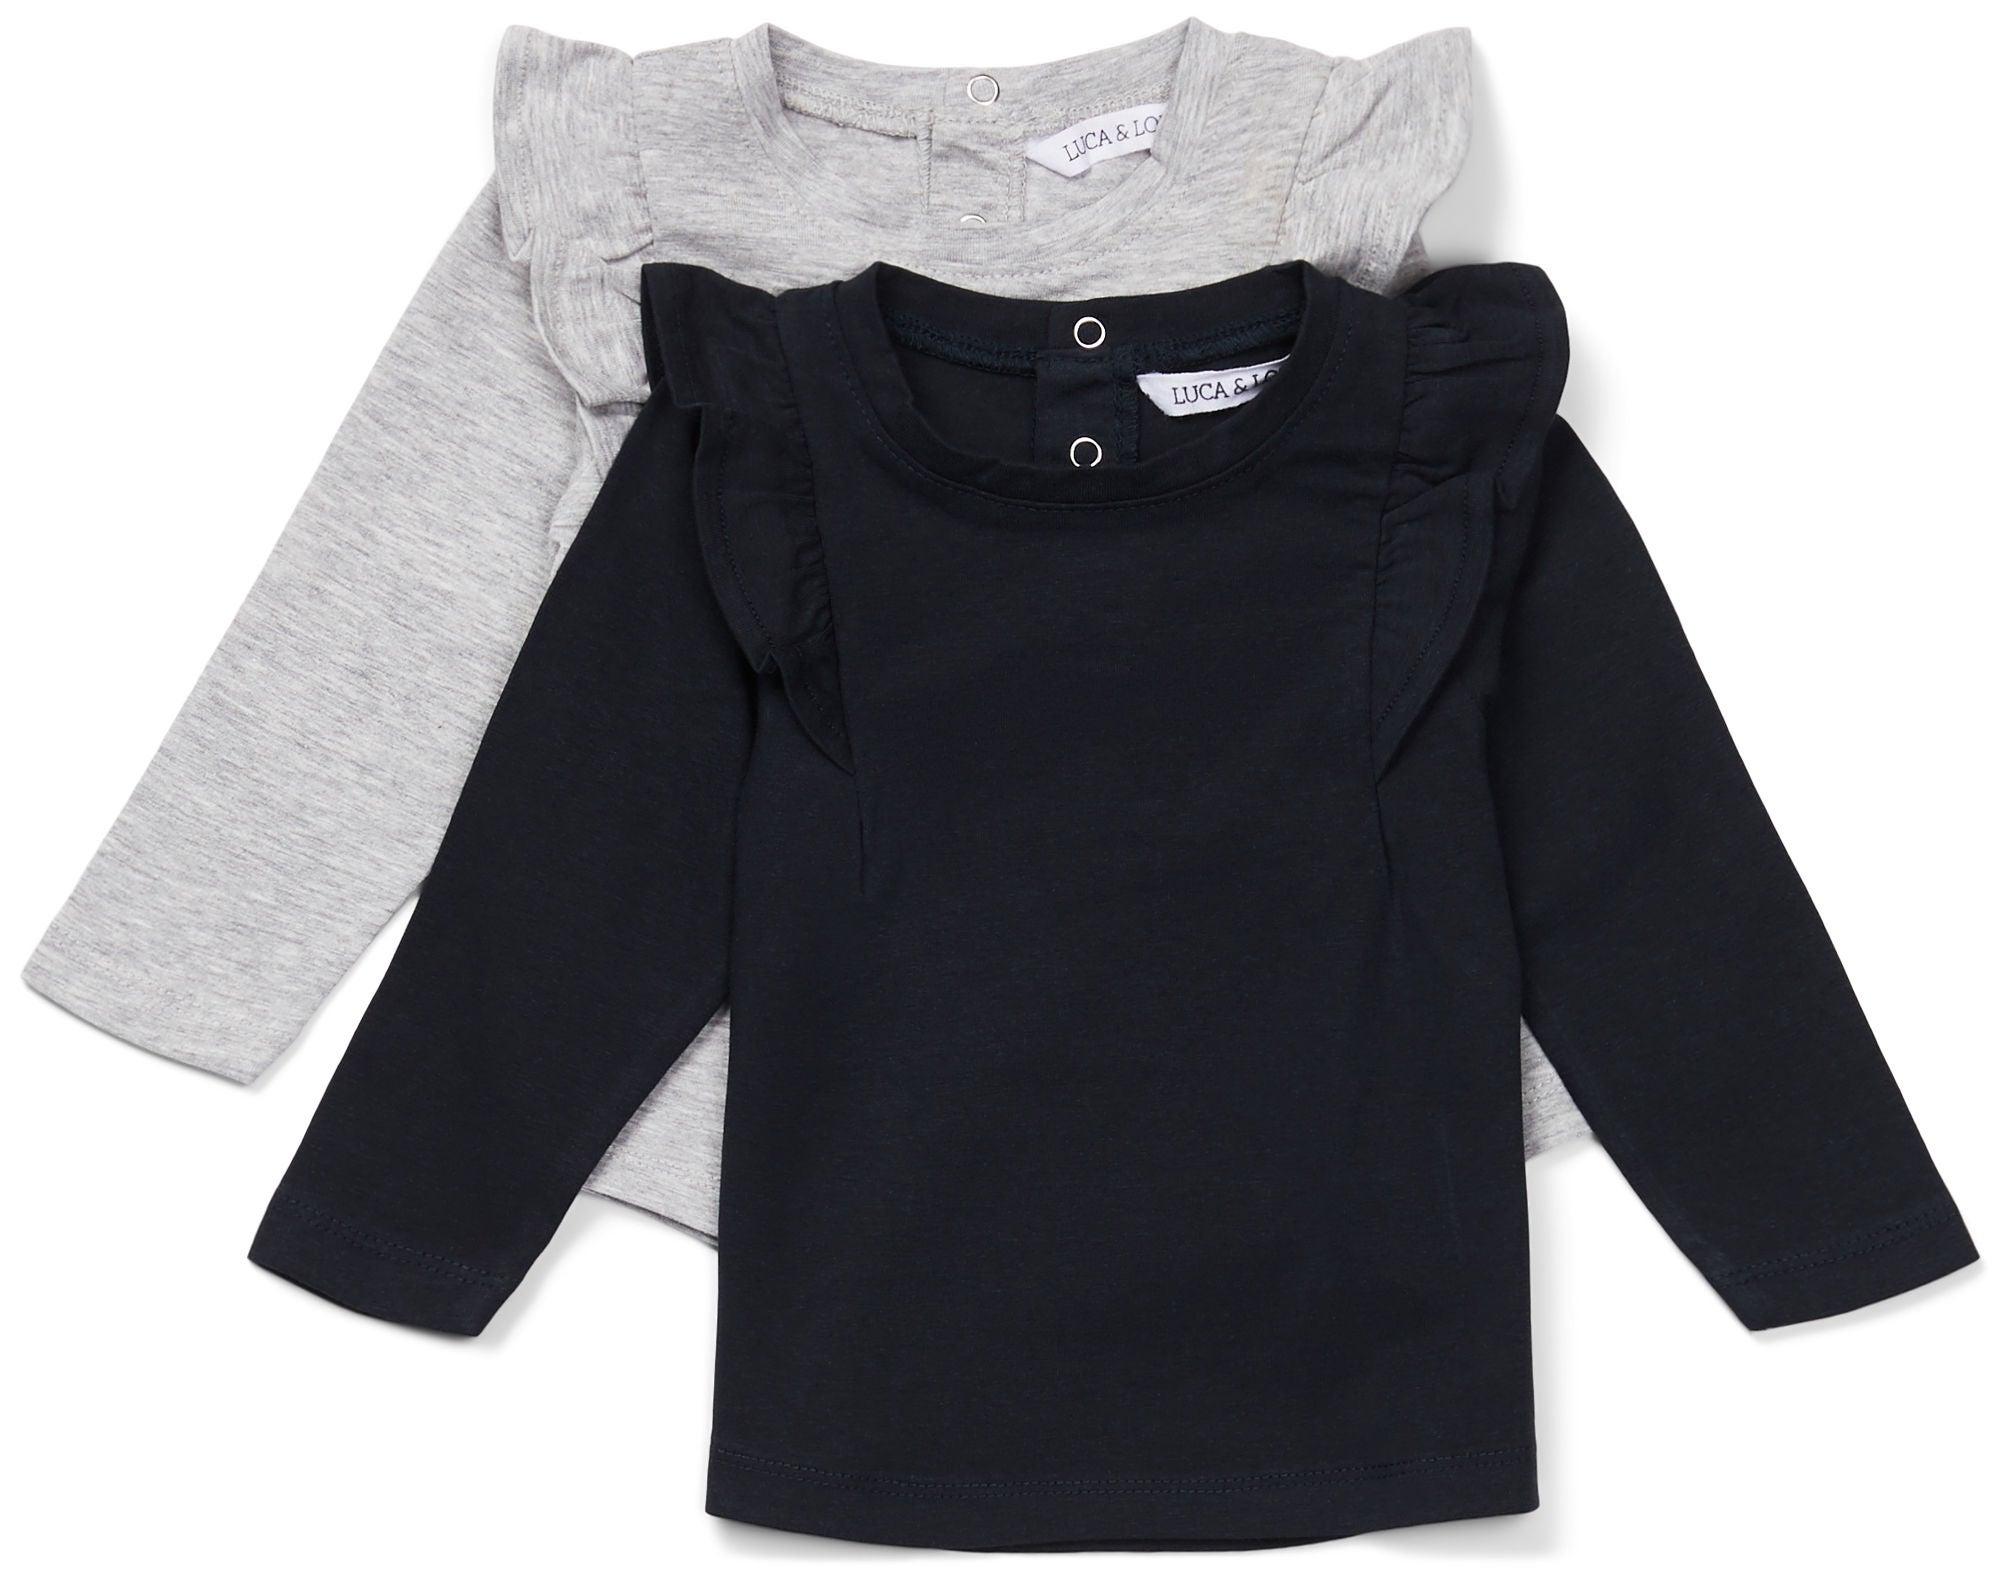 Luca & Lola Lina Topp 2-pack Baby, Grey Melange/Phantom 56